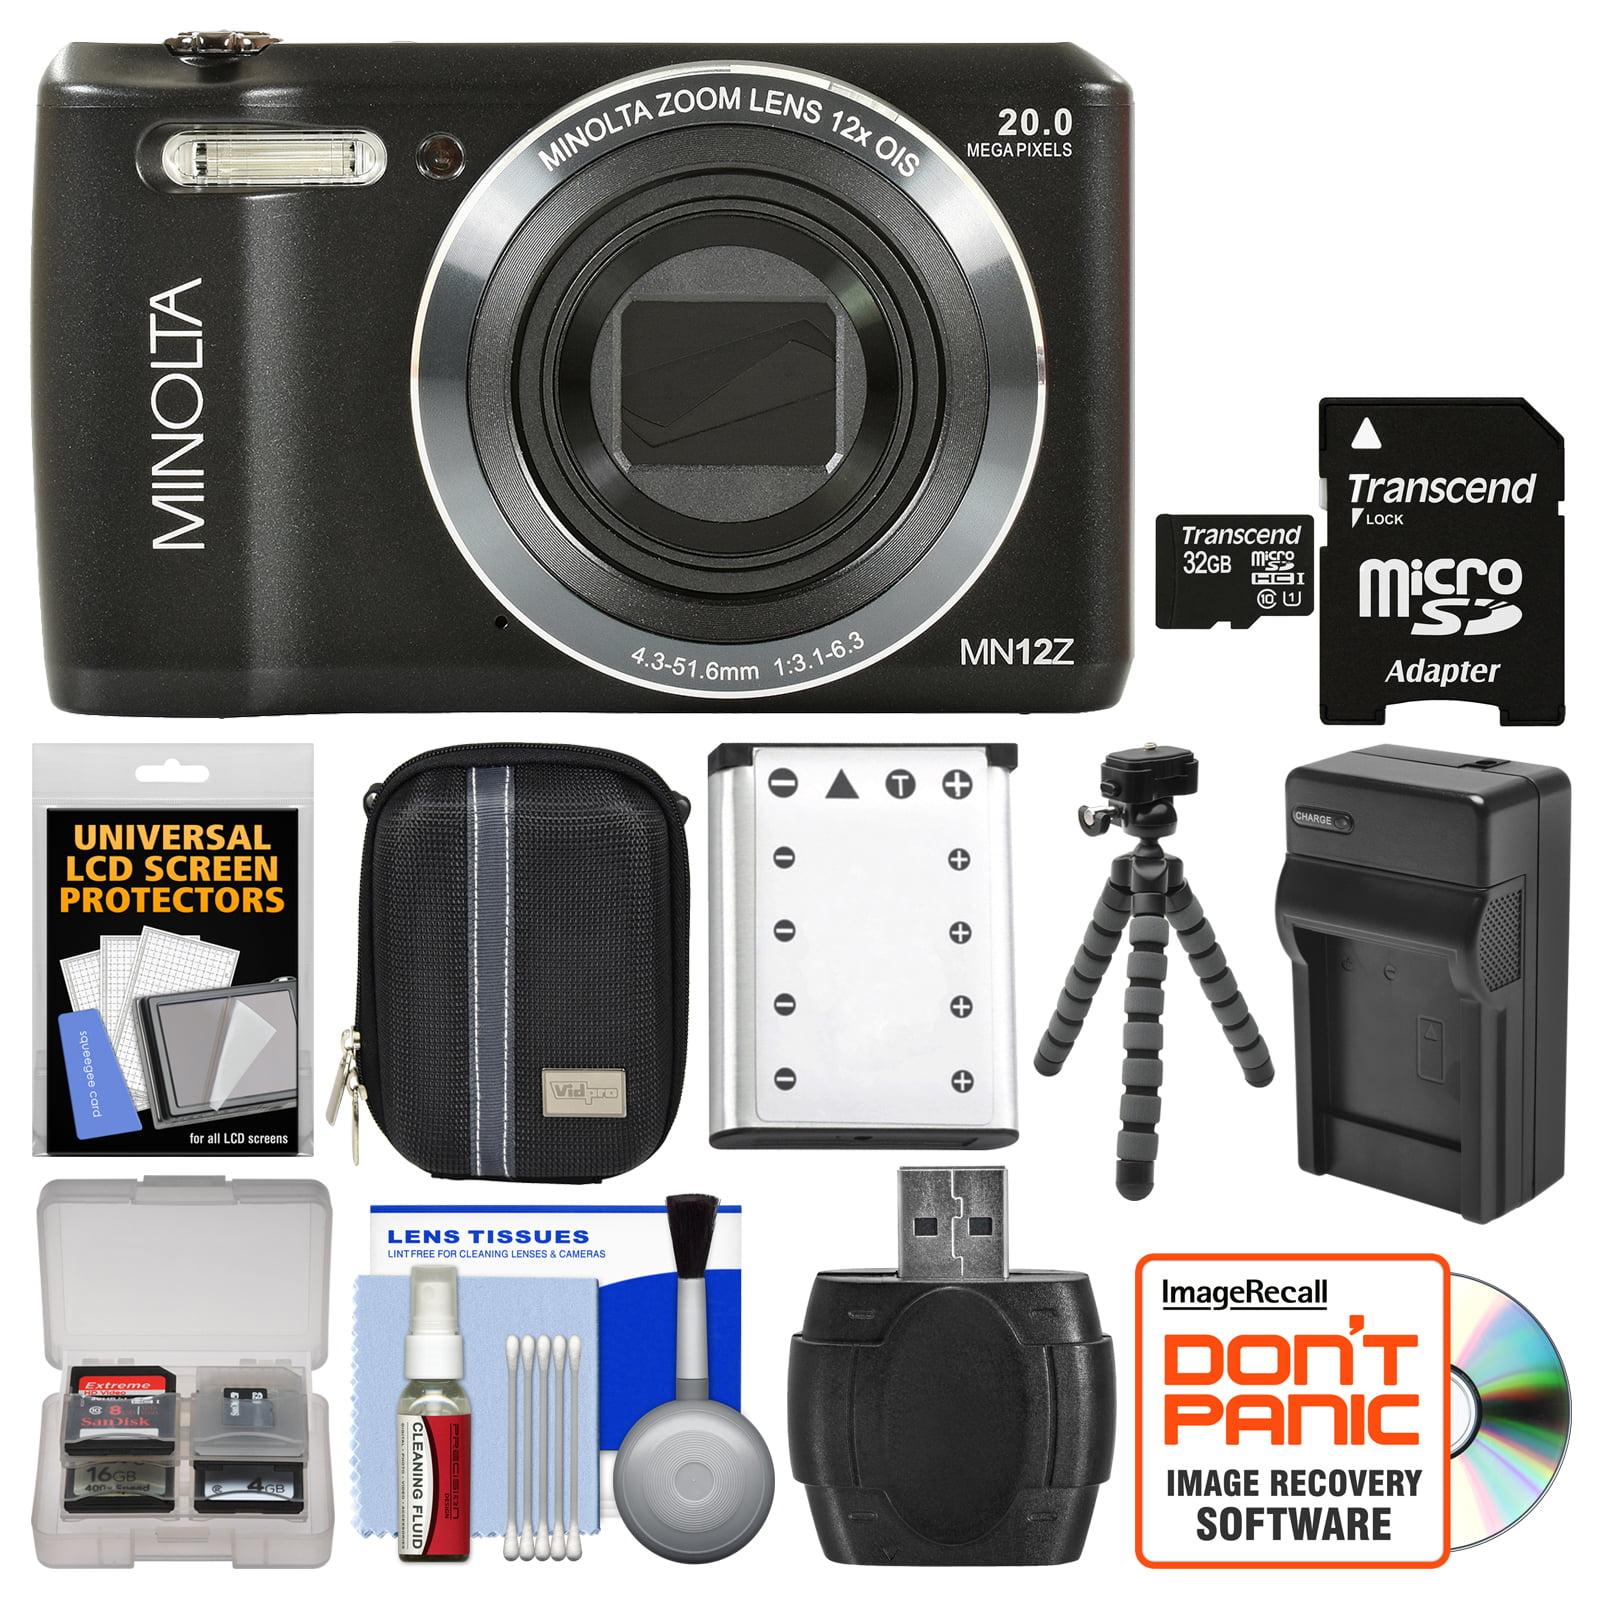 Konica Minolta MN12Z OIS 12x Zoom Wi-Fi Digital Camera (B...